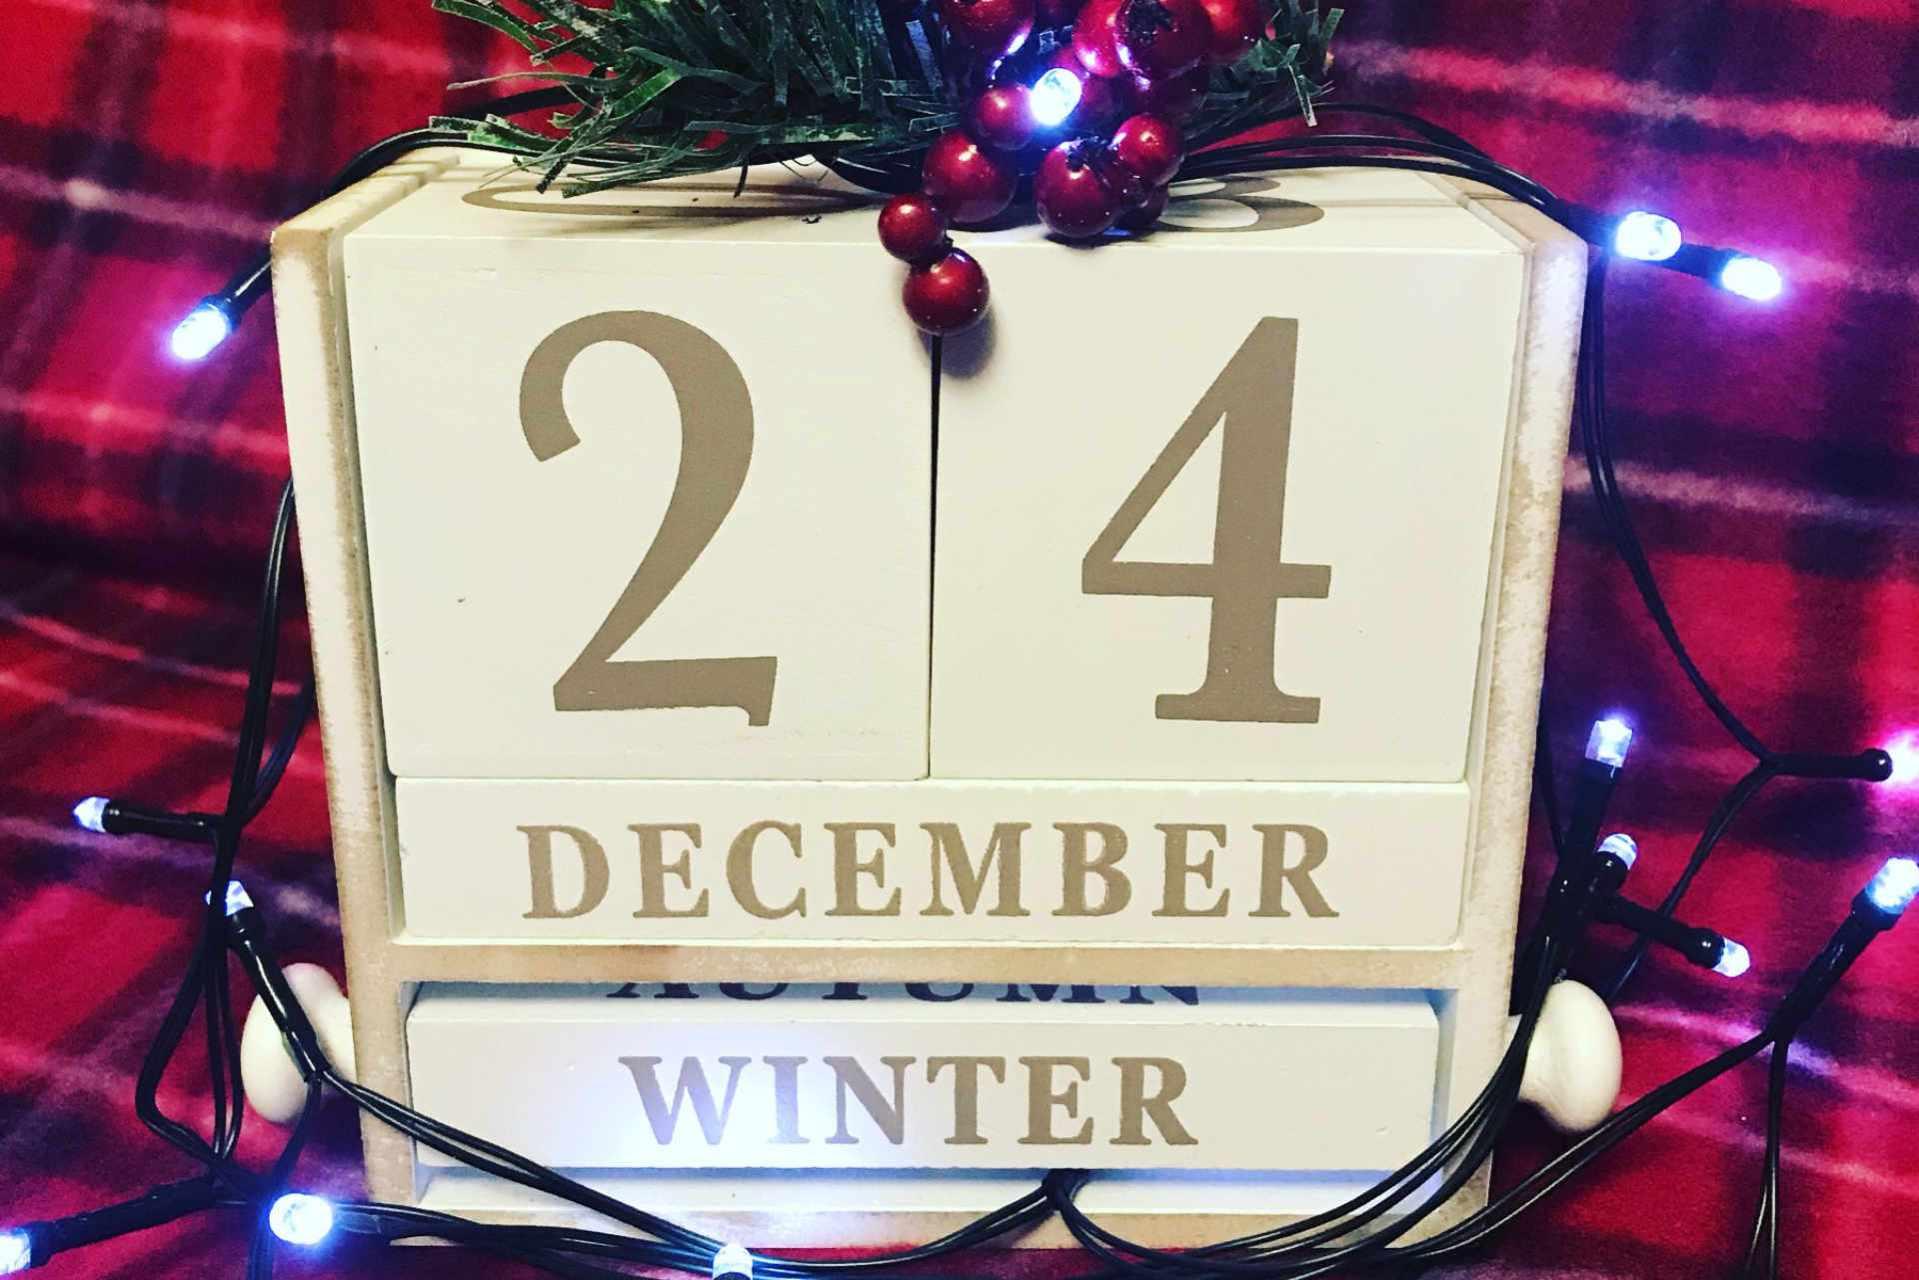 Christmas Eve Box Ideas for Adults ⋆ princessdeia